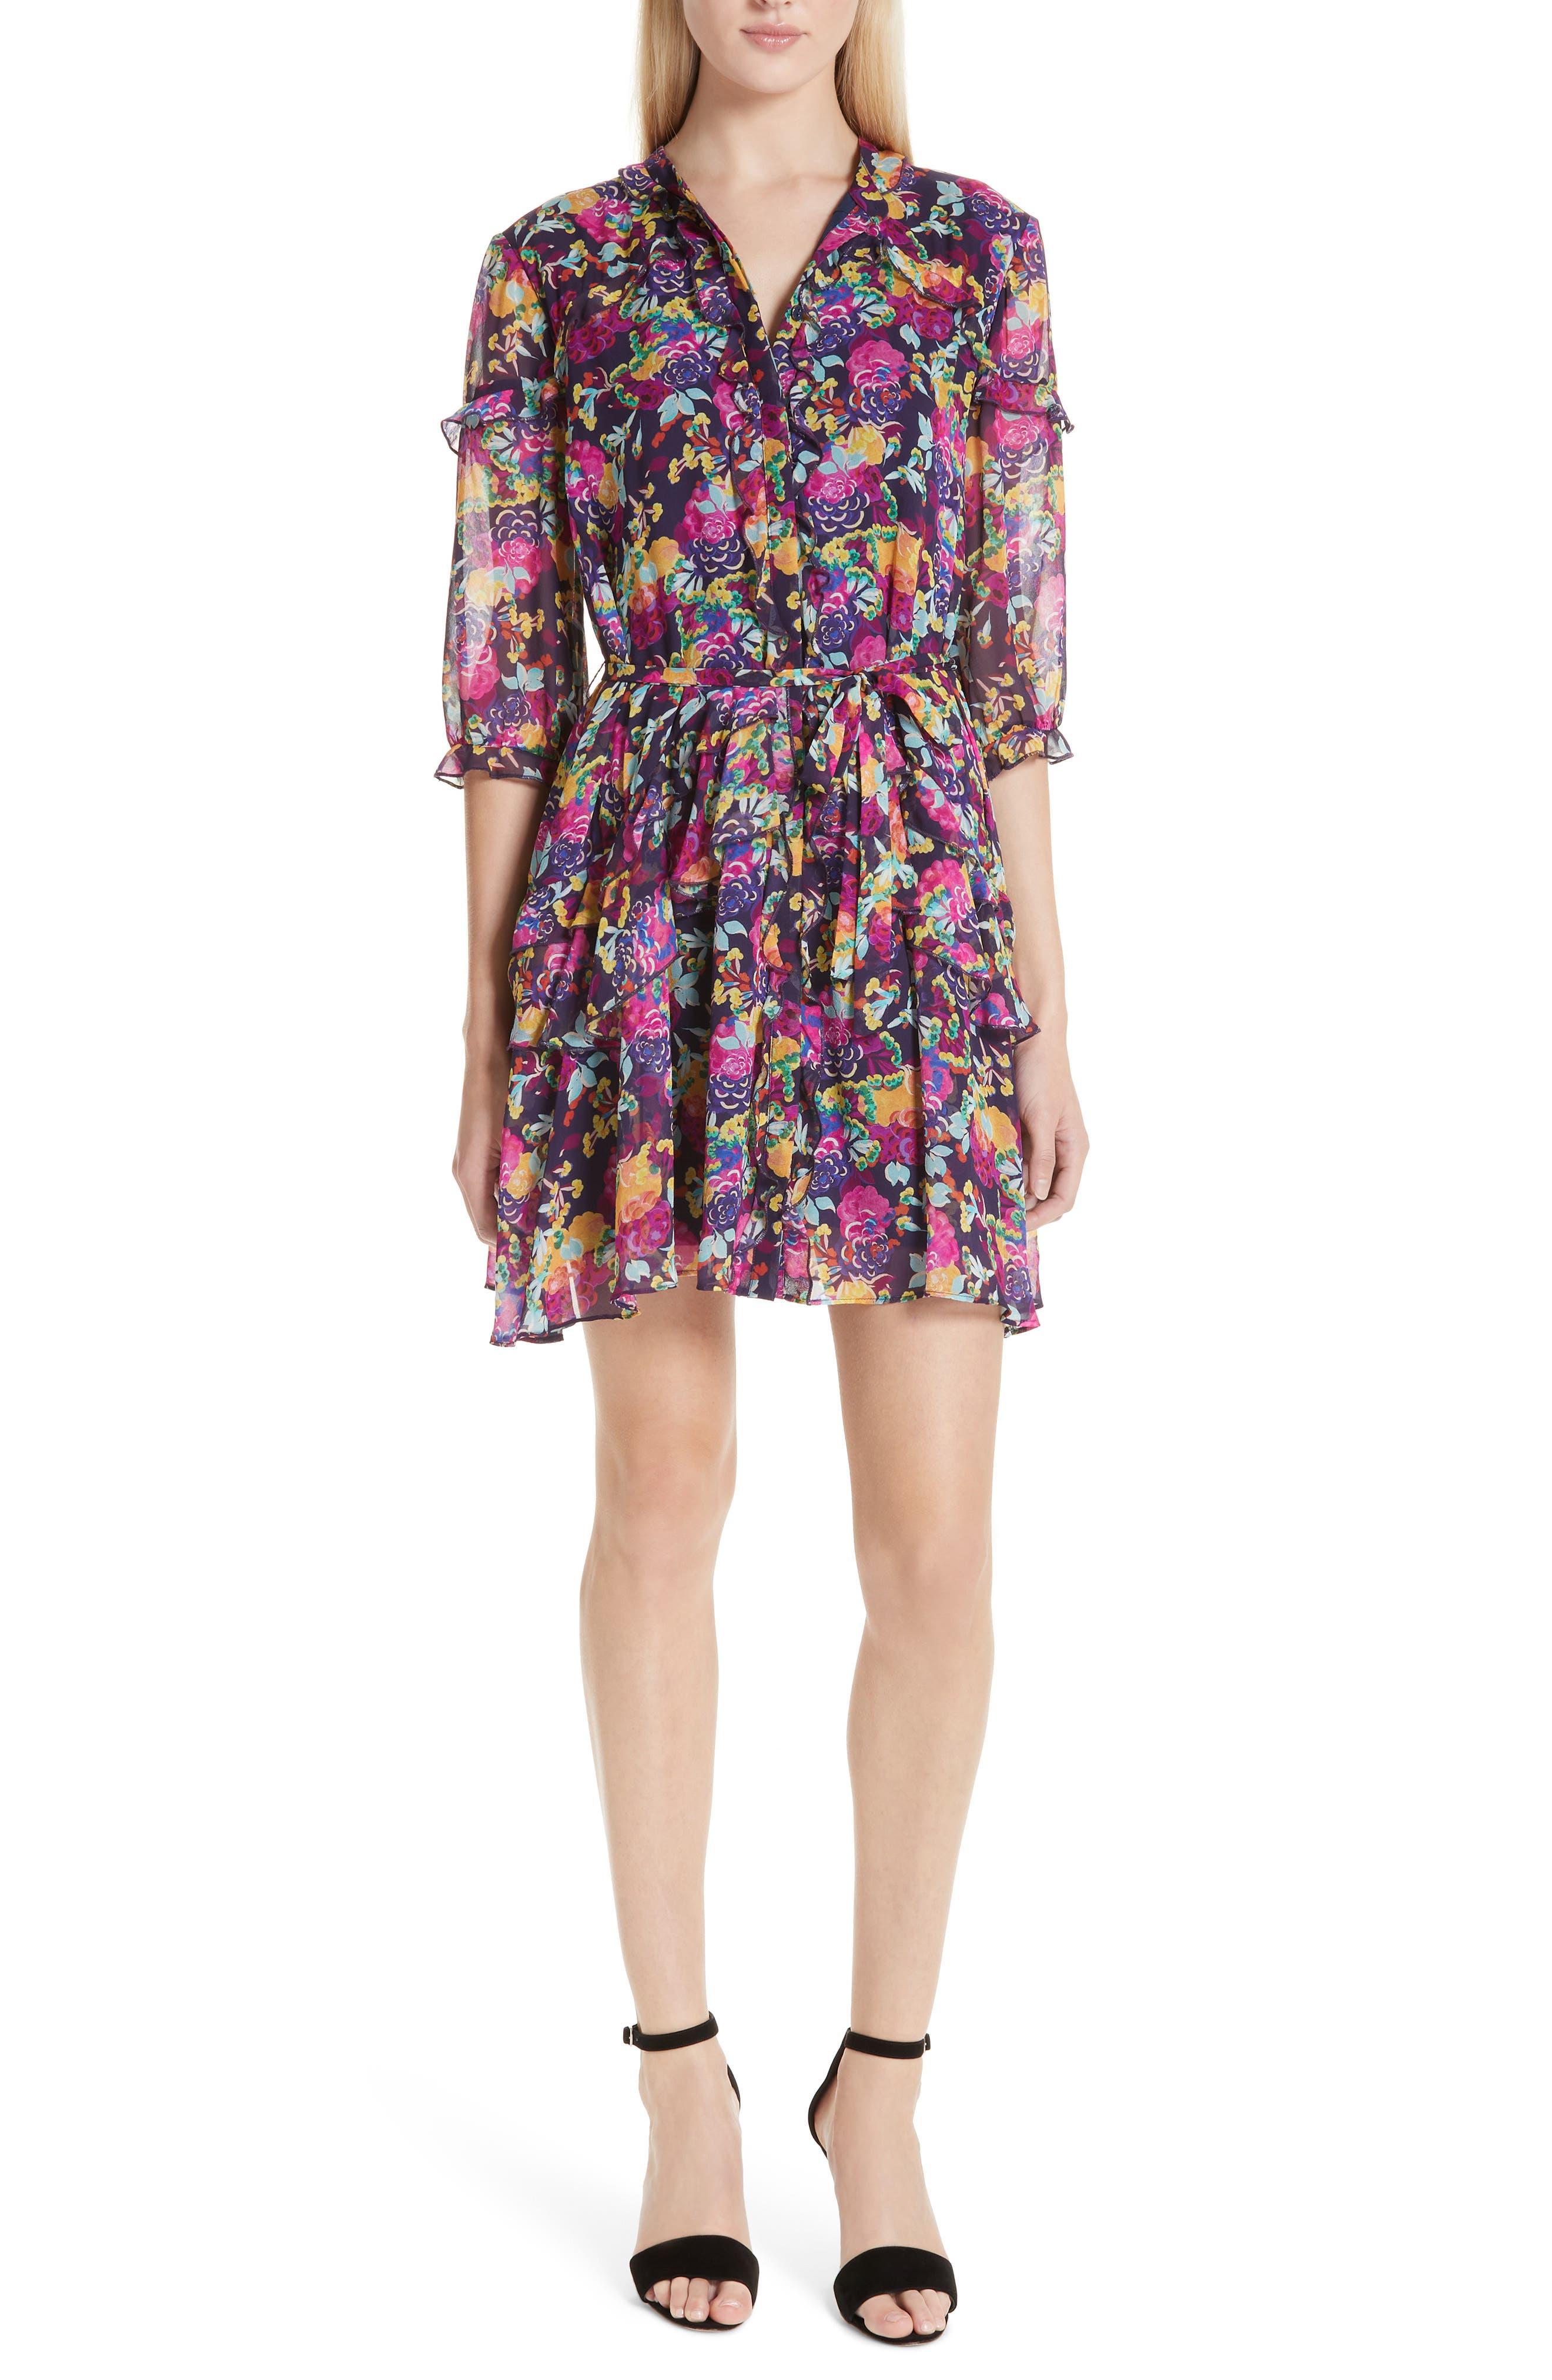 SALONI, Tilly Ruffle Silk Dress, Main thumbnail 1, color, CAMELLIA